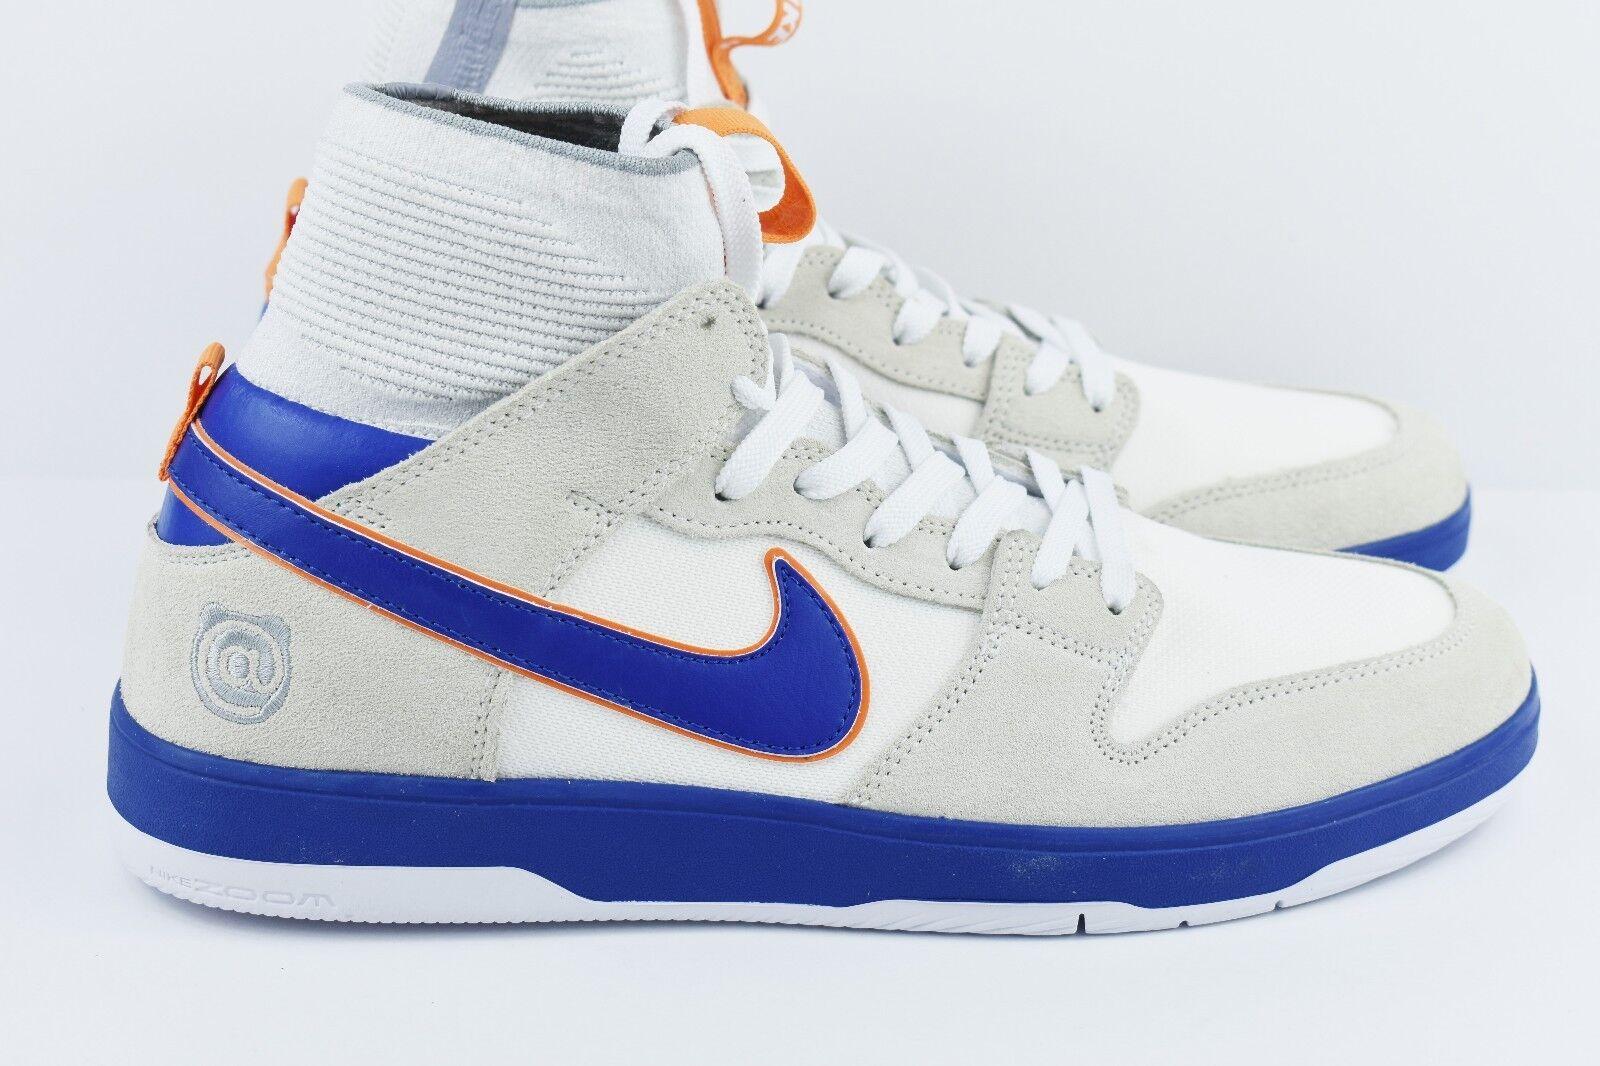 Nike sb medicom zoom canestro alto elt qs Uomo 10 taglia 10 Uomo scarpe 918287 147 bearbrick fa2ffb